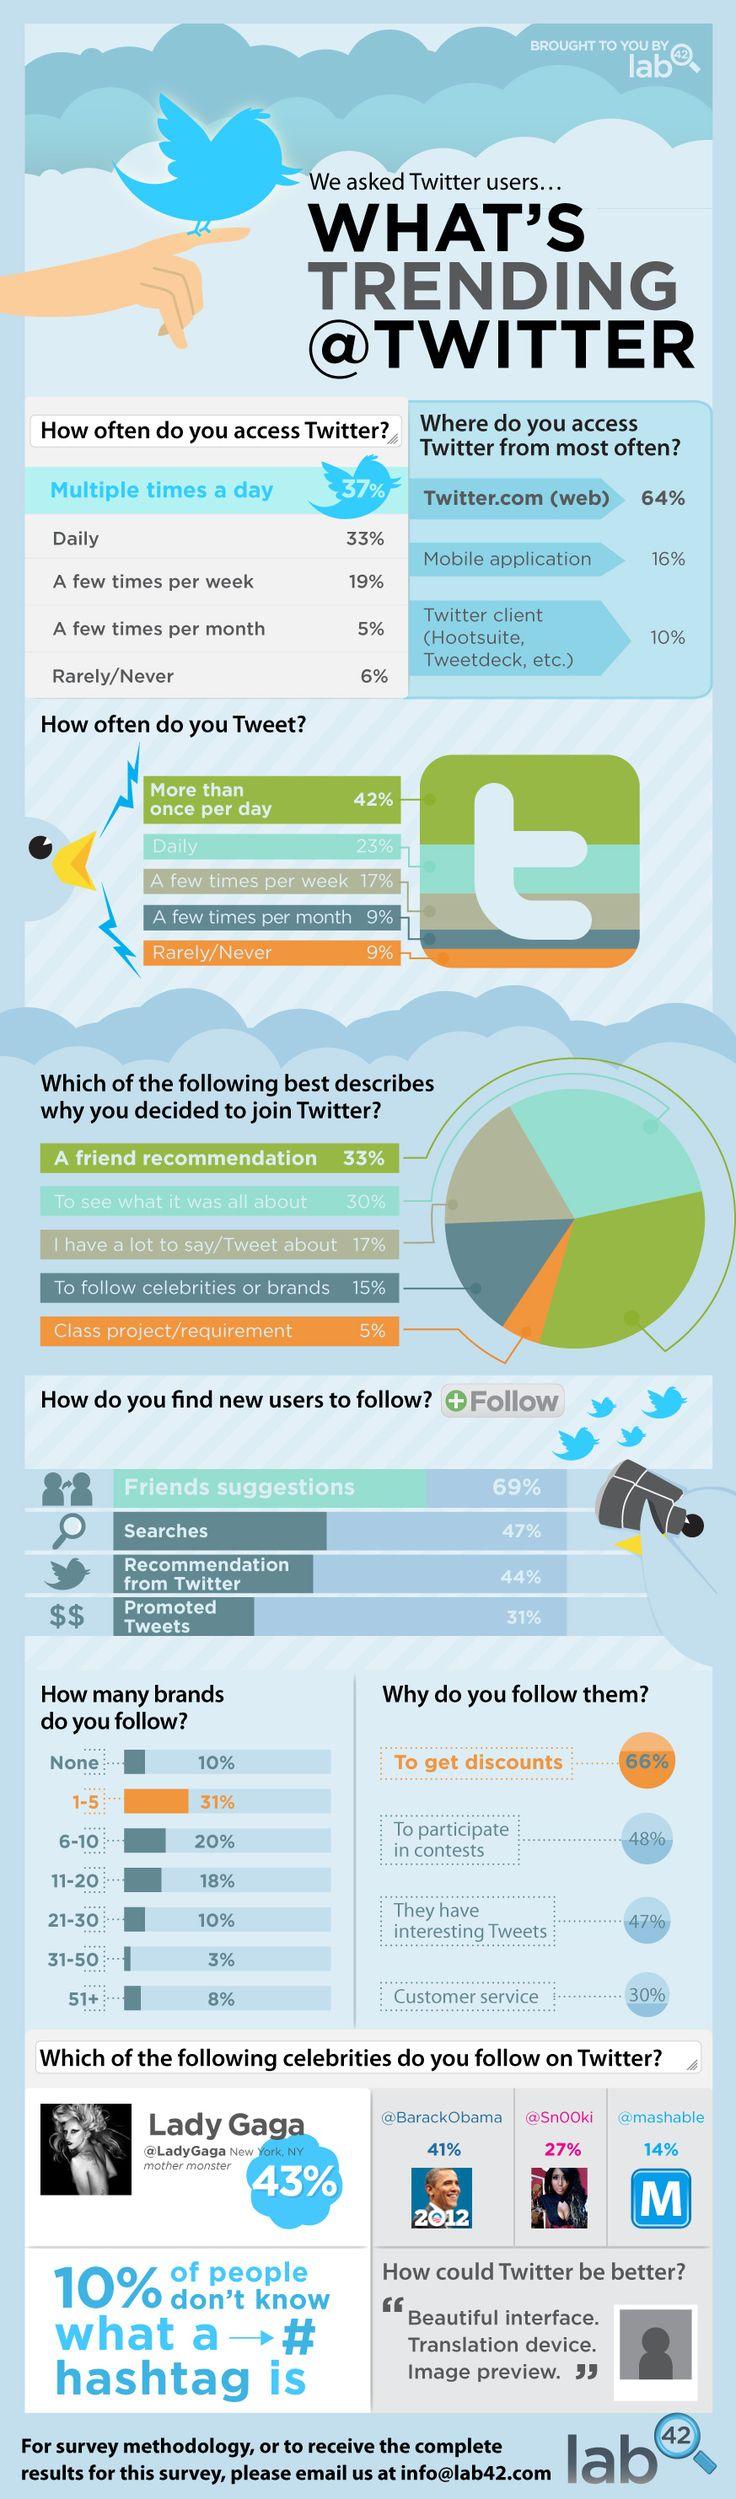 How do You Use Twitter? [INFOGRAPHIC] - Jeffbullas's Blog via .@Jeff Bullas